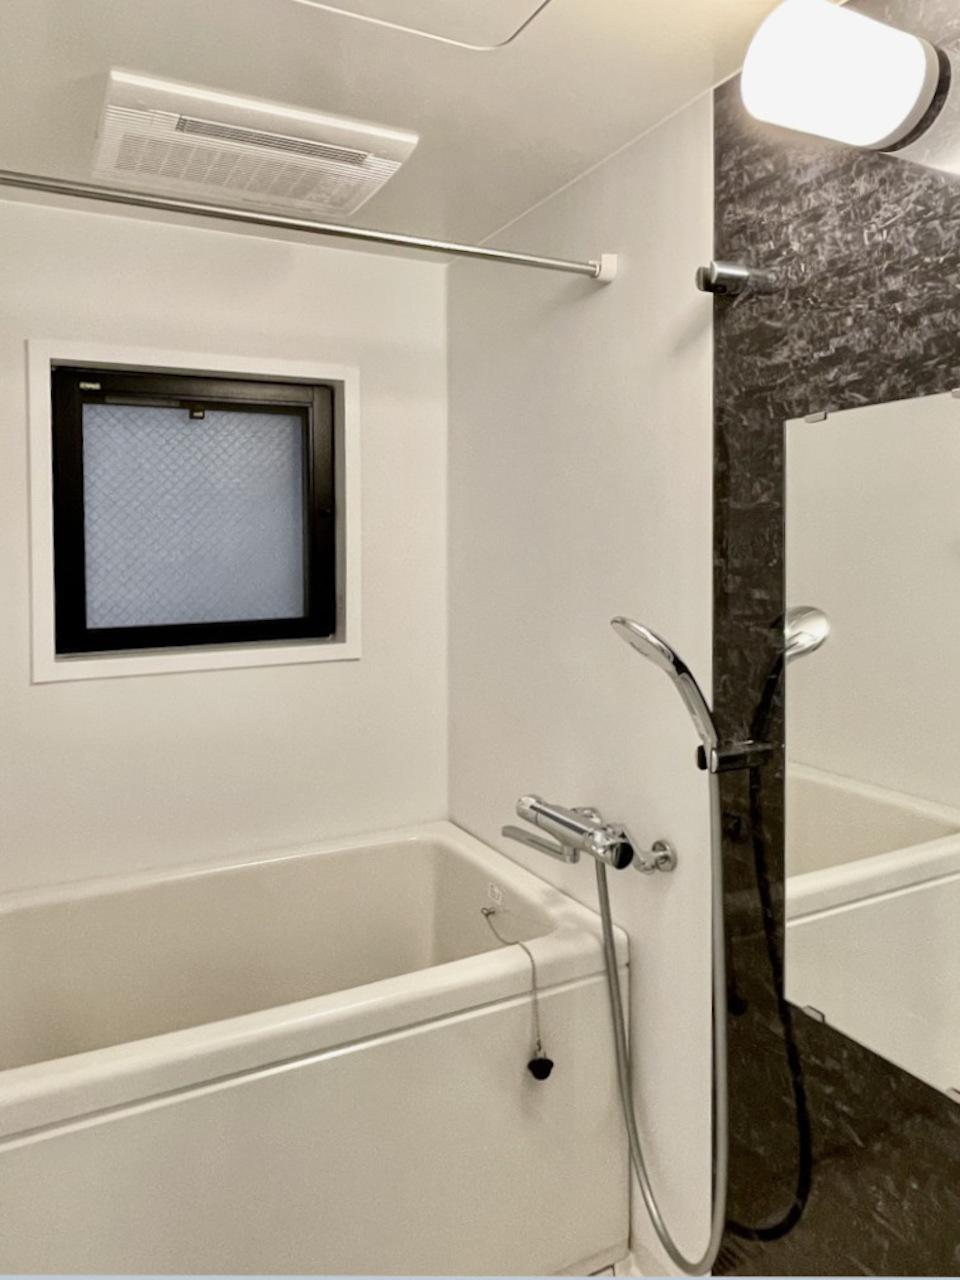 新品お風呂。浴室乾燥機付。